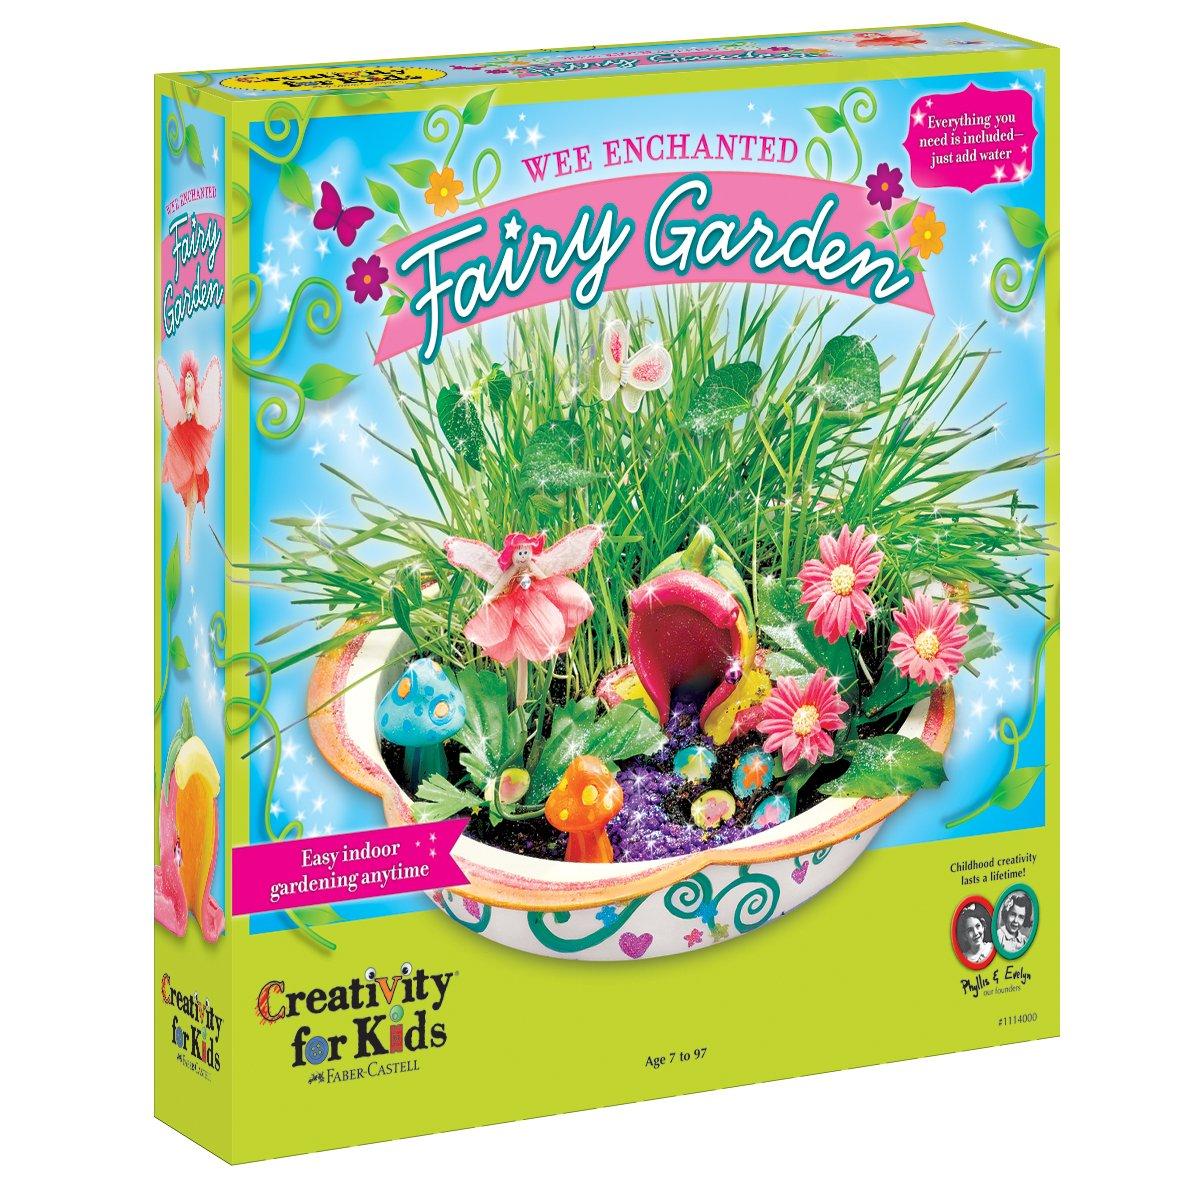 Fairy Garden Ideas And How To S A Fun Family Outdoor Activity For Spring